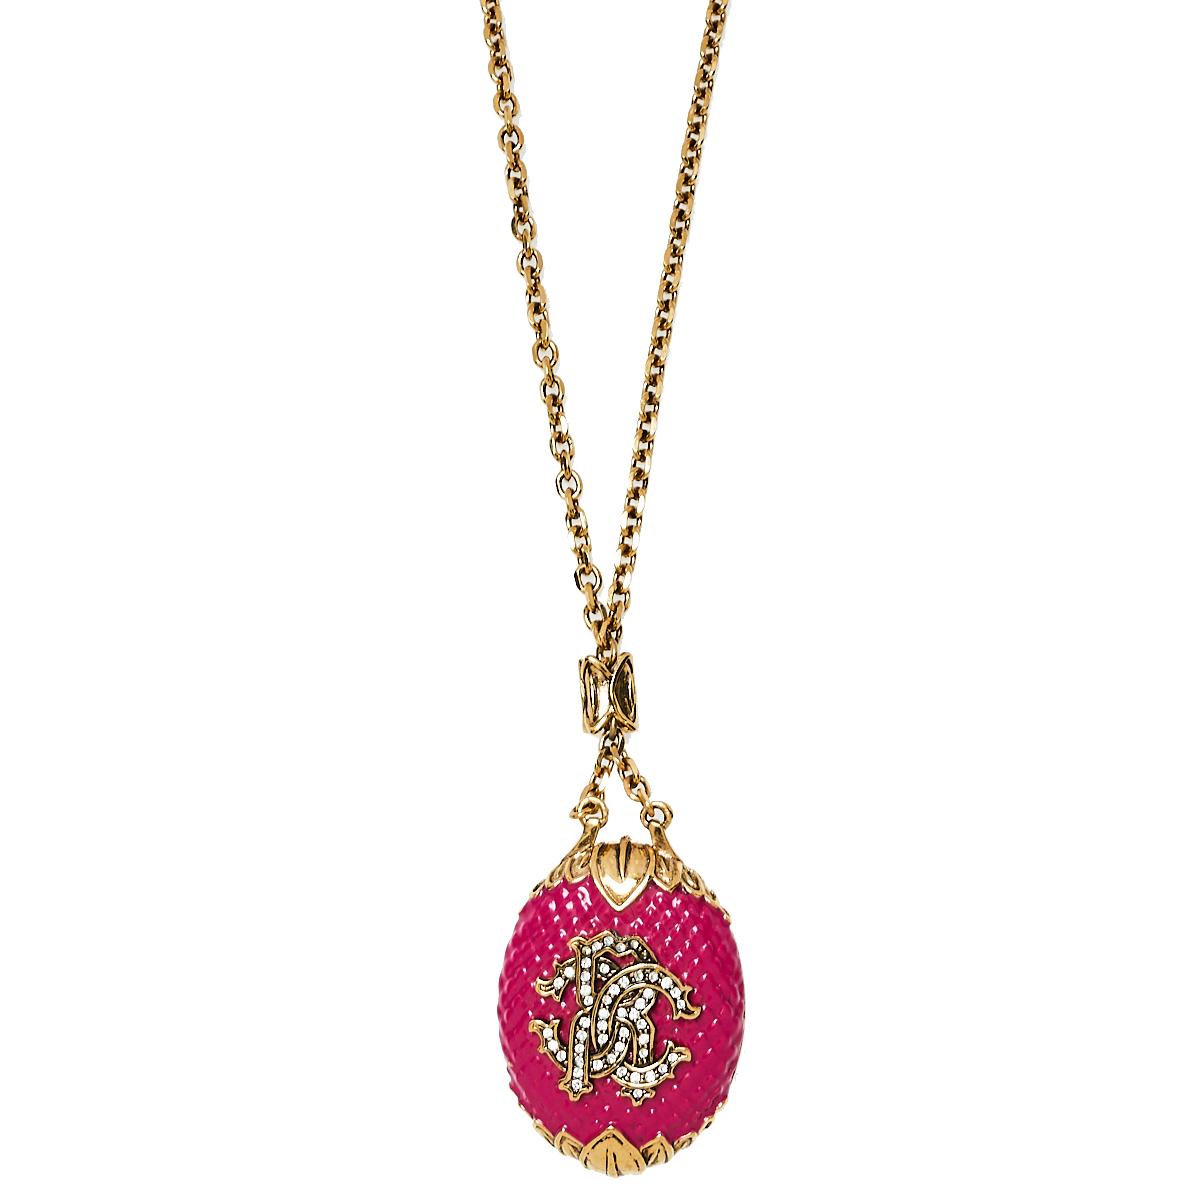 Roberto Cavalli Pink Enamel Crystal Logo Pendant Necklace